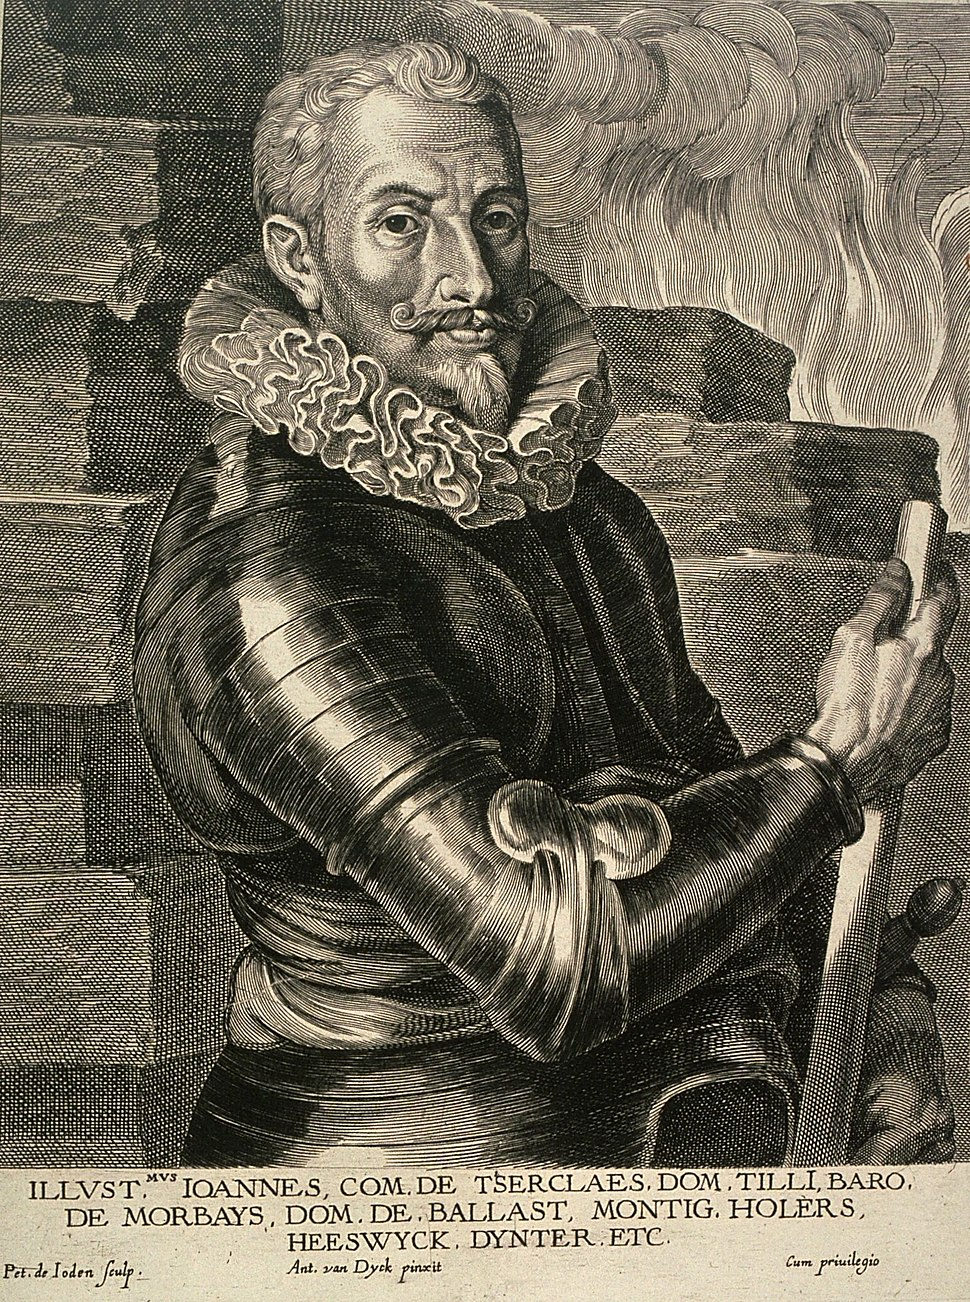 Johann Tserclaes Tilly